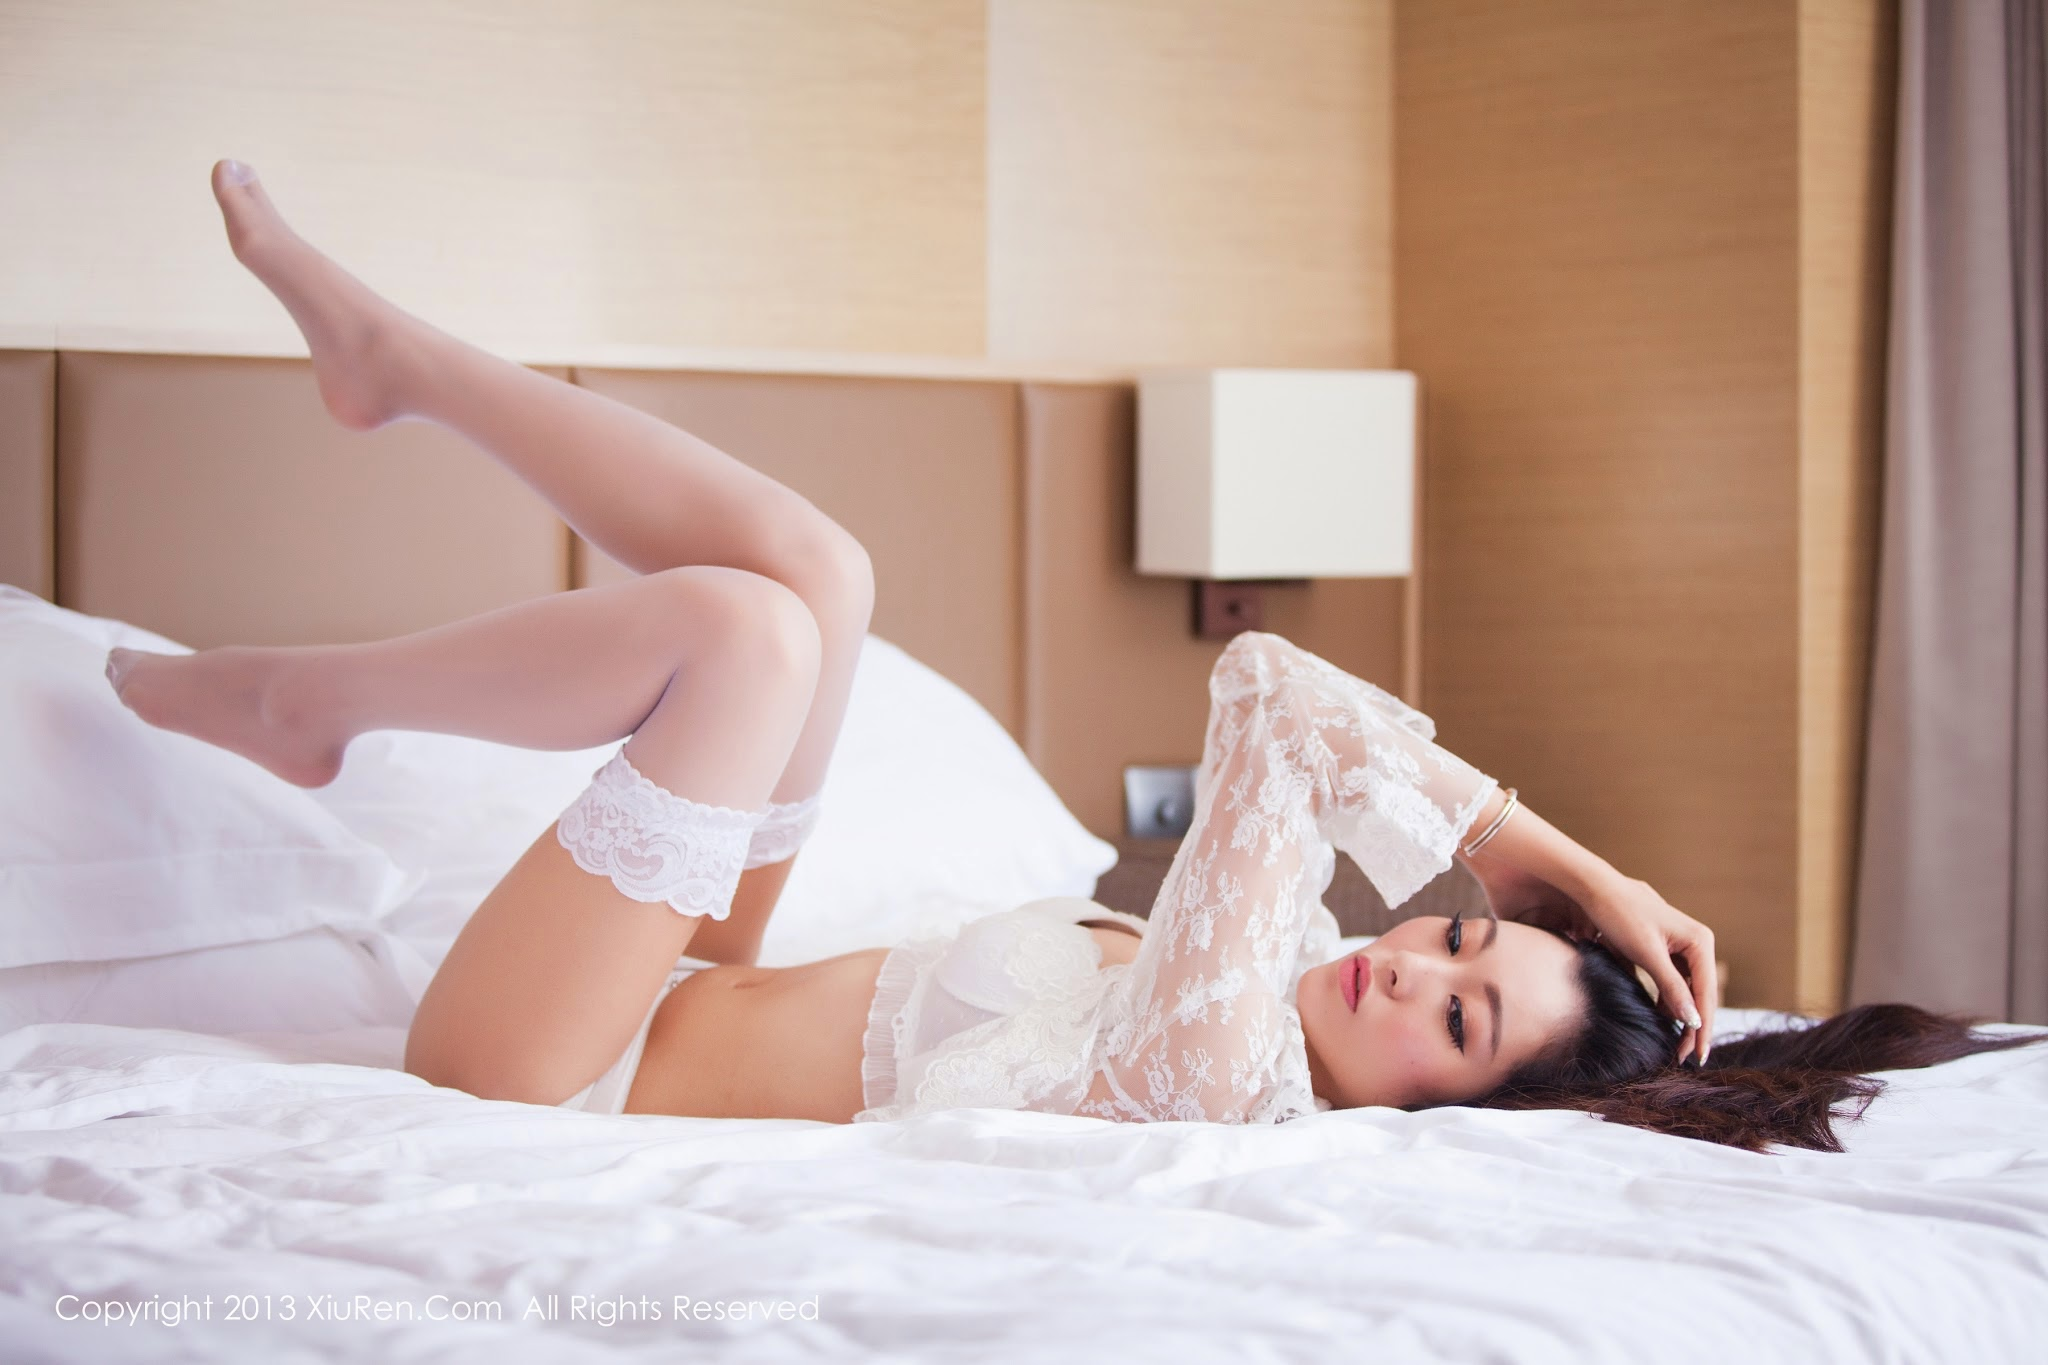 gravure panties japanese 10 yr junior idol thong models junior idol